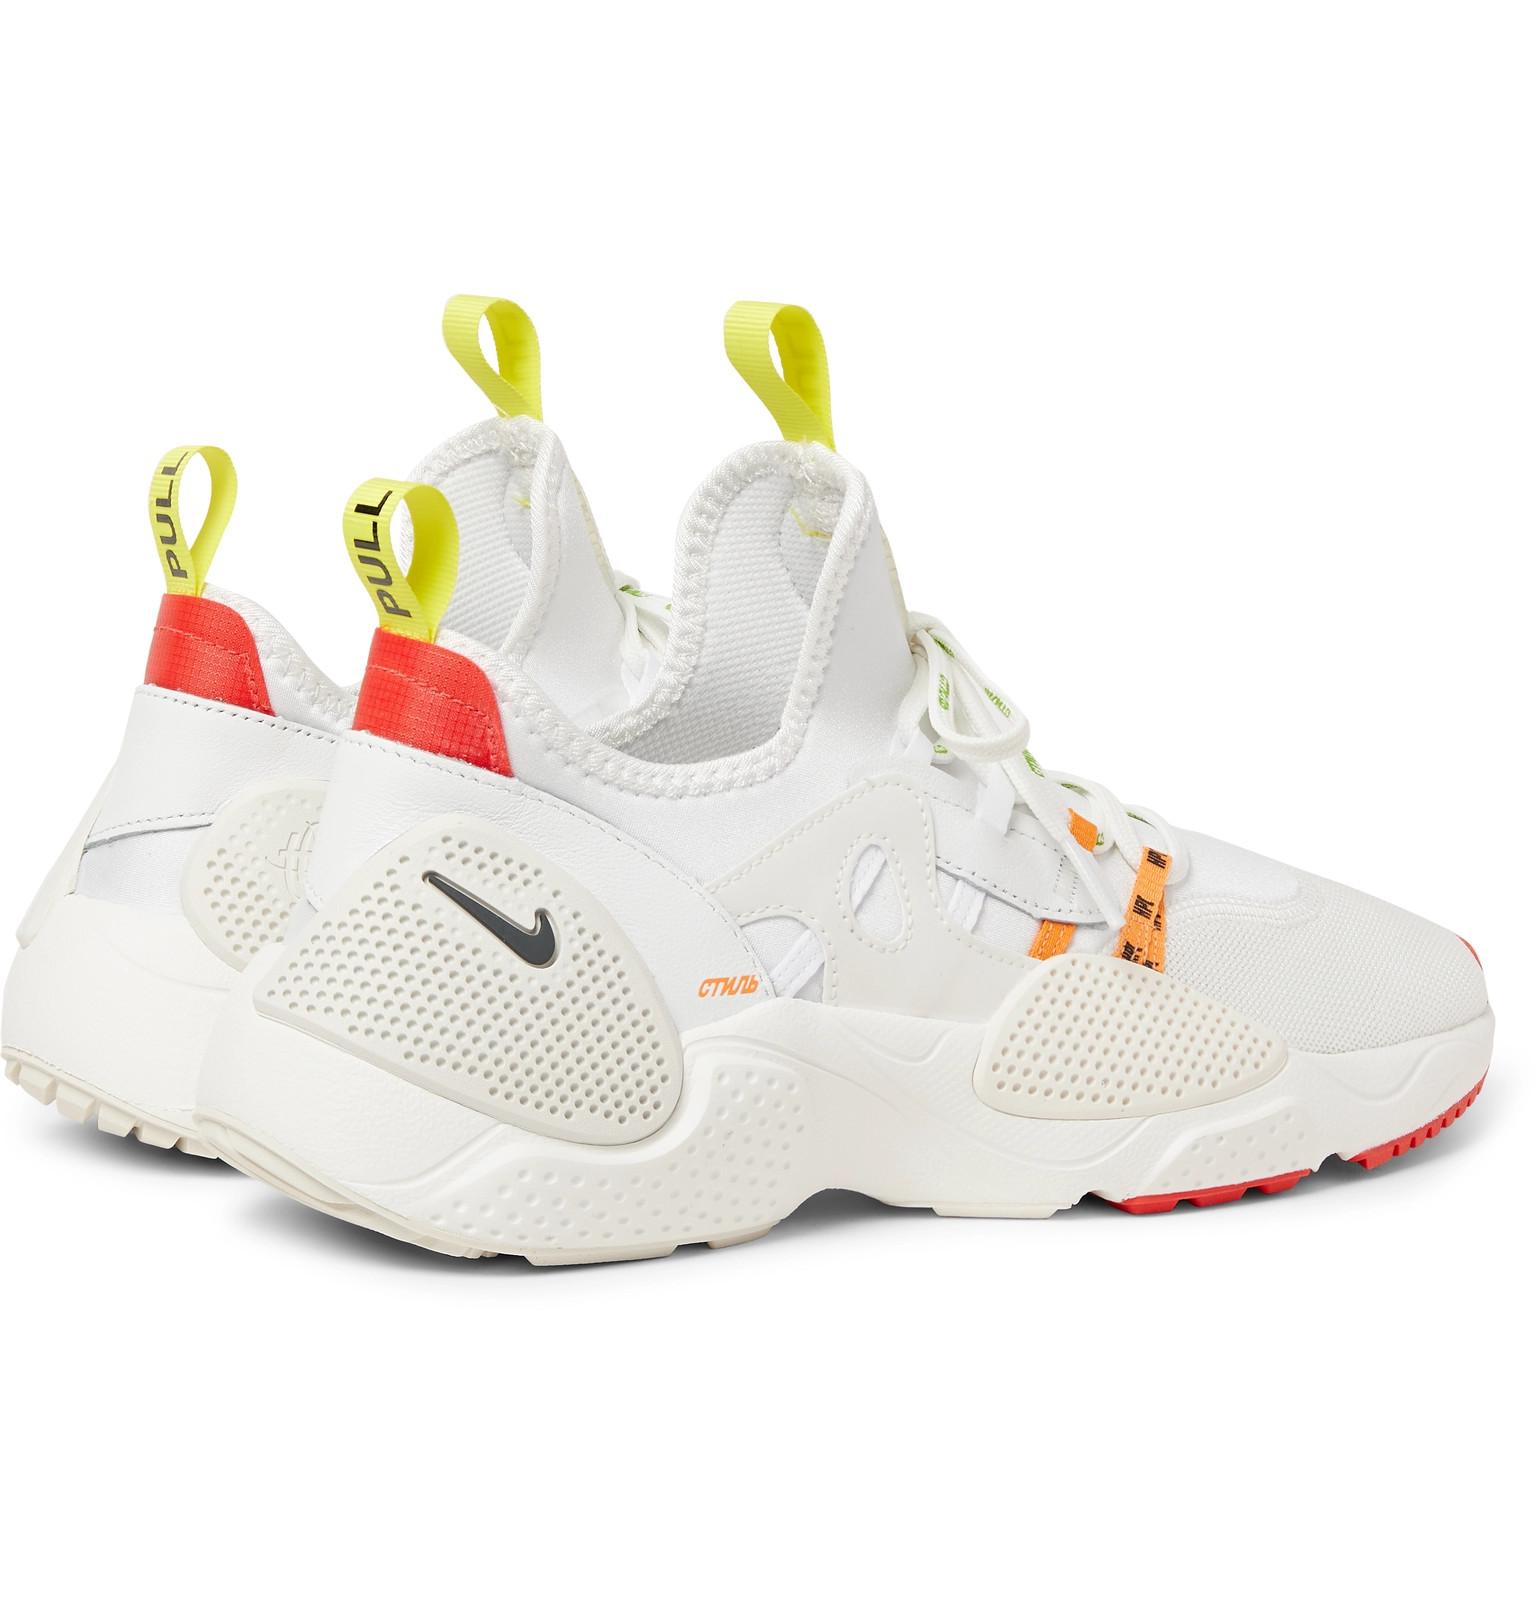 c7fefbef8641 Nike - + Heron Preston Huarache EDGE Sneakers